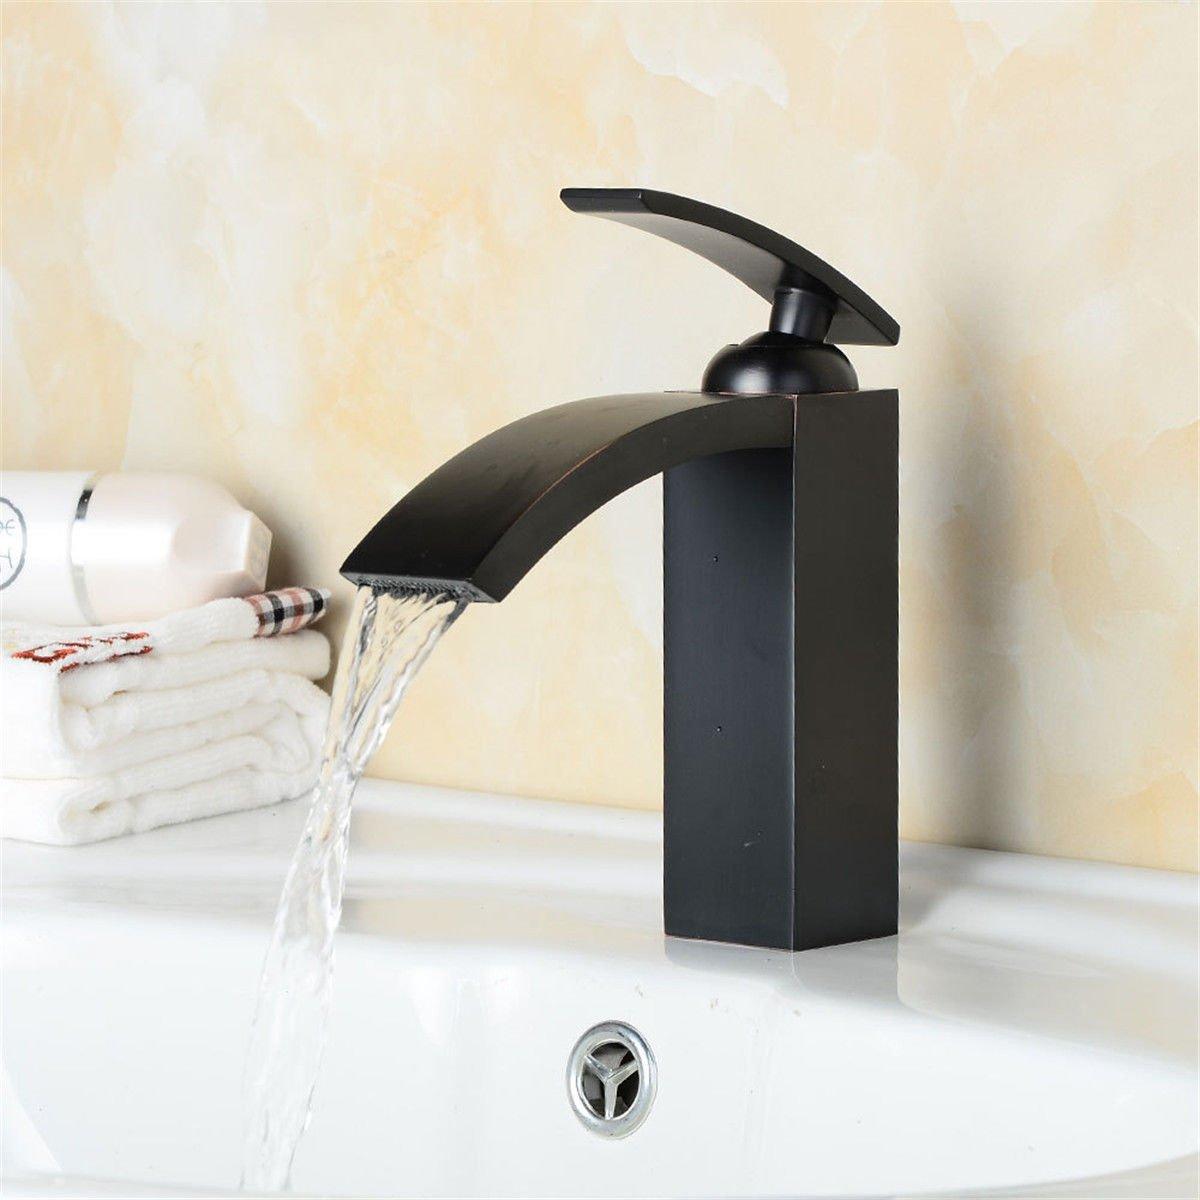 YSRBath Modernos Modernos Modernos Grifos del Fregadero del Cuarto de baño Retro Negro Cascada fría y Caliente Cocina Mezclador Grifos de Lavabo a7b07f